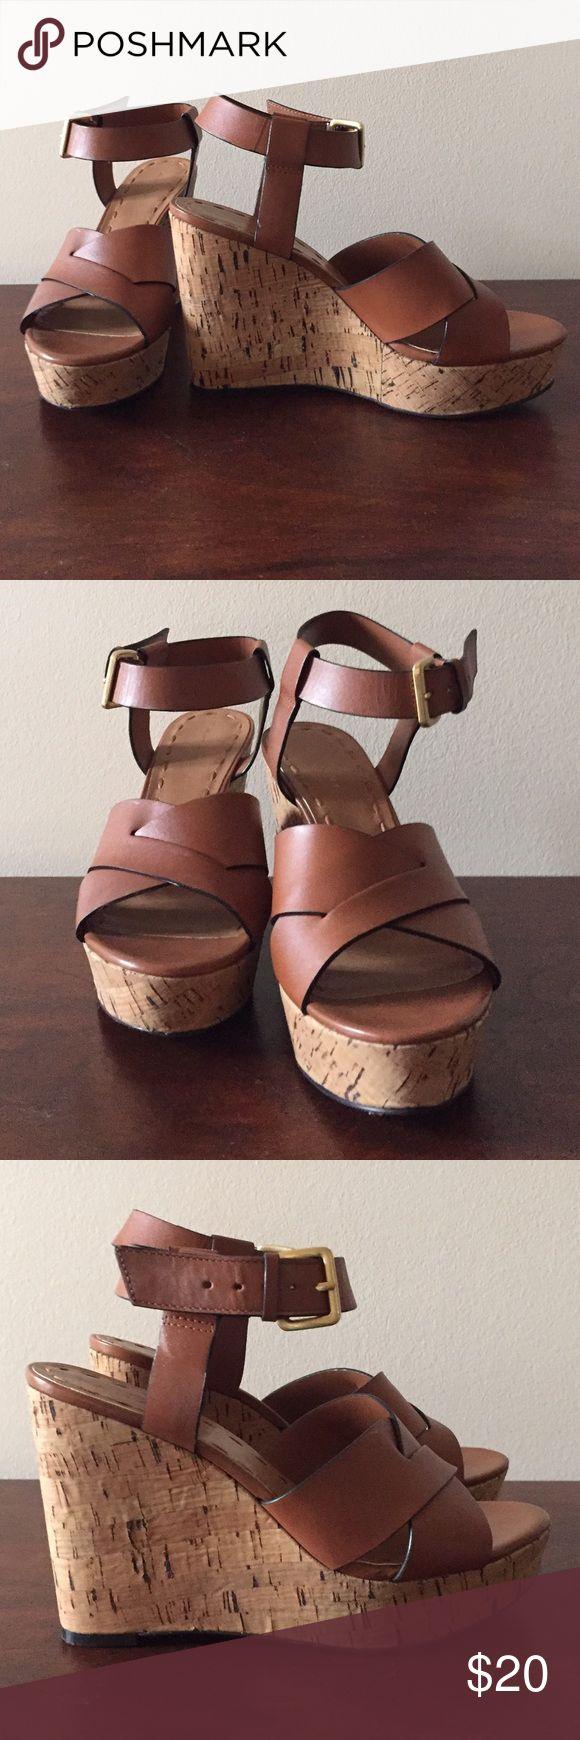 Shoes Tahari brown leather wedge sandals. Tahari Shoes Sandals